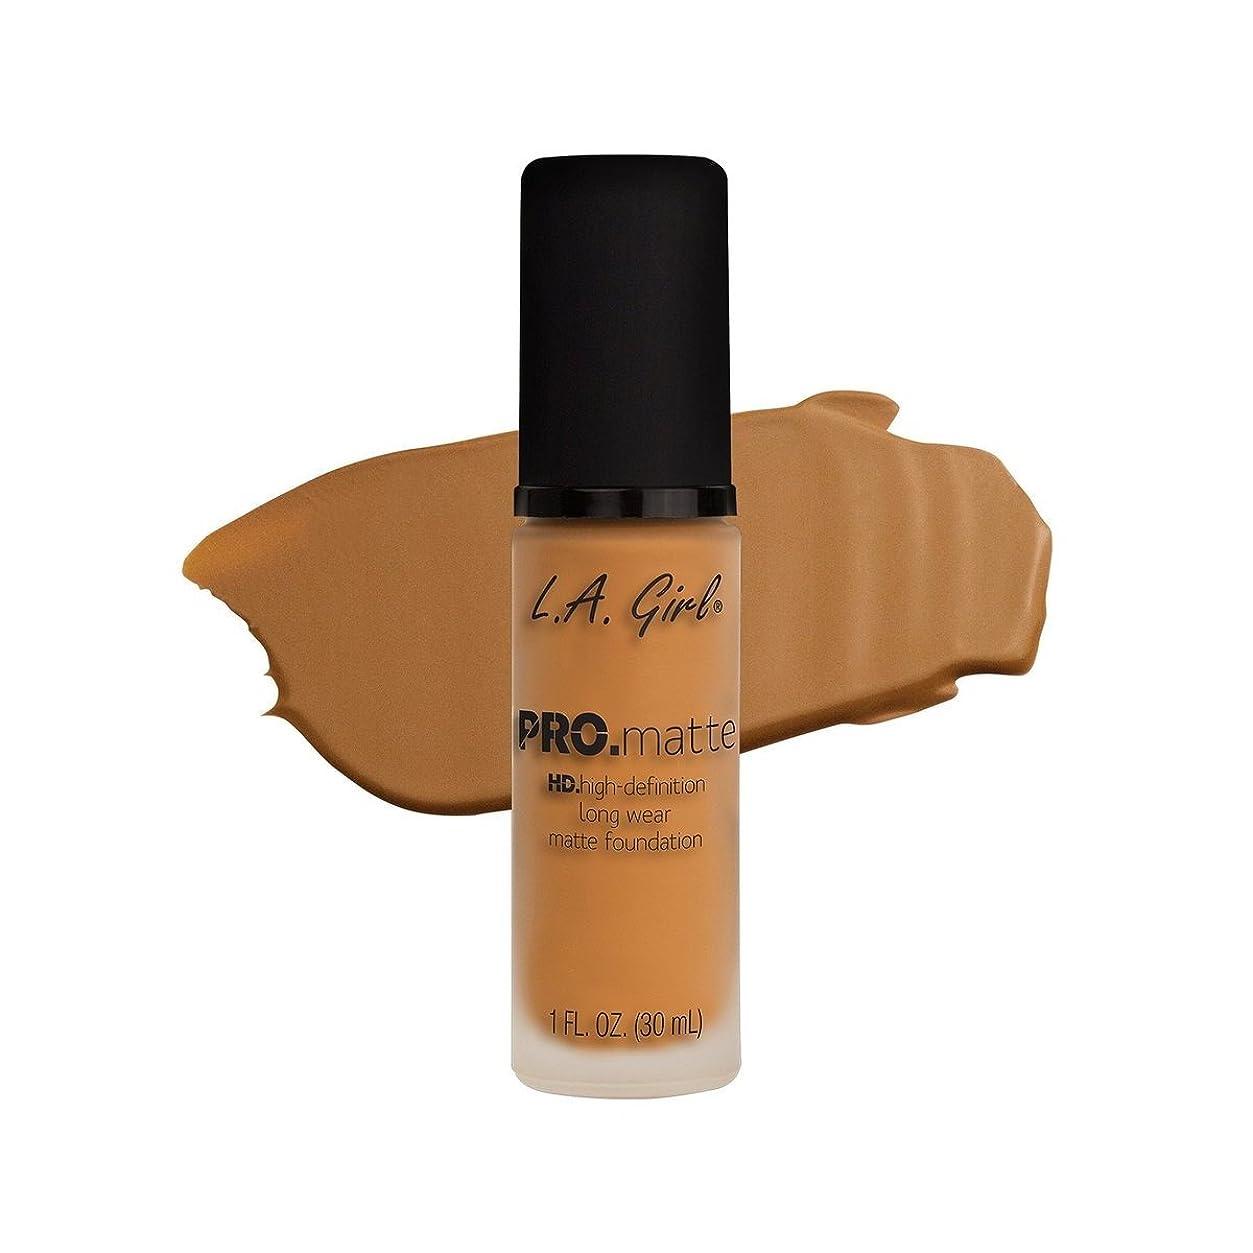 成長調整可能請求書(3 Pack) L.A. GIRL Pro Matte Foundation - Golden Bronze (並行輸入品)